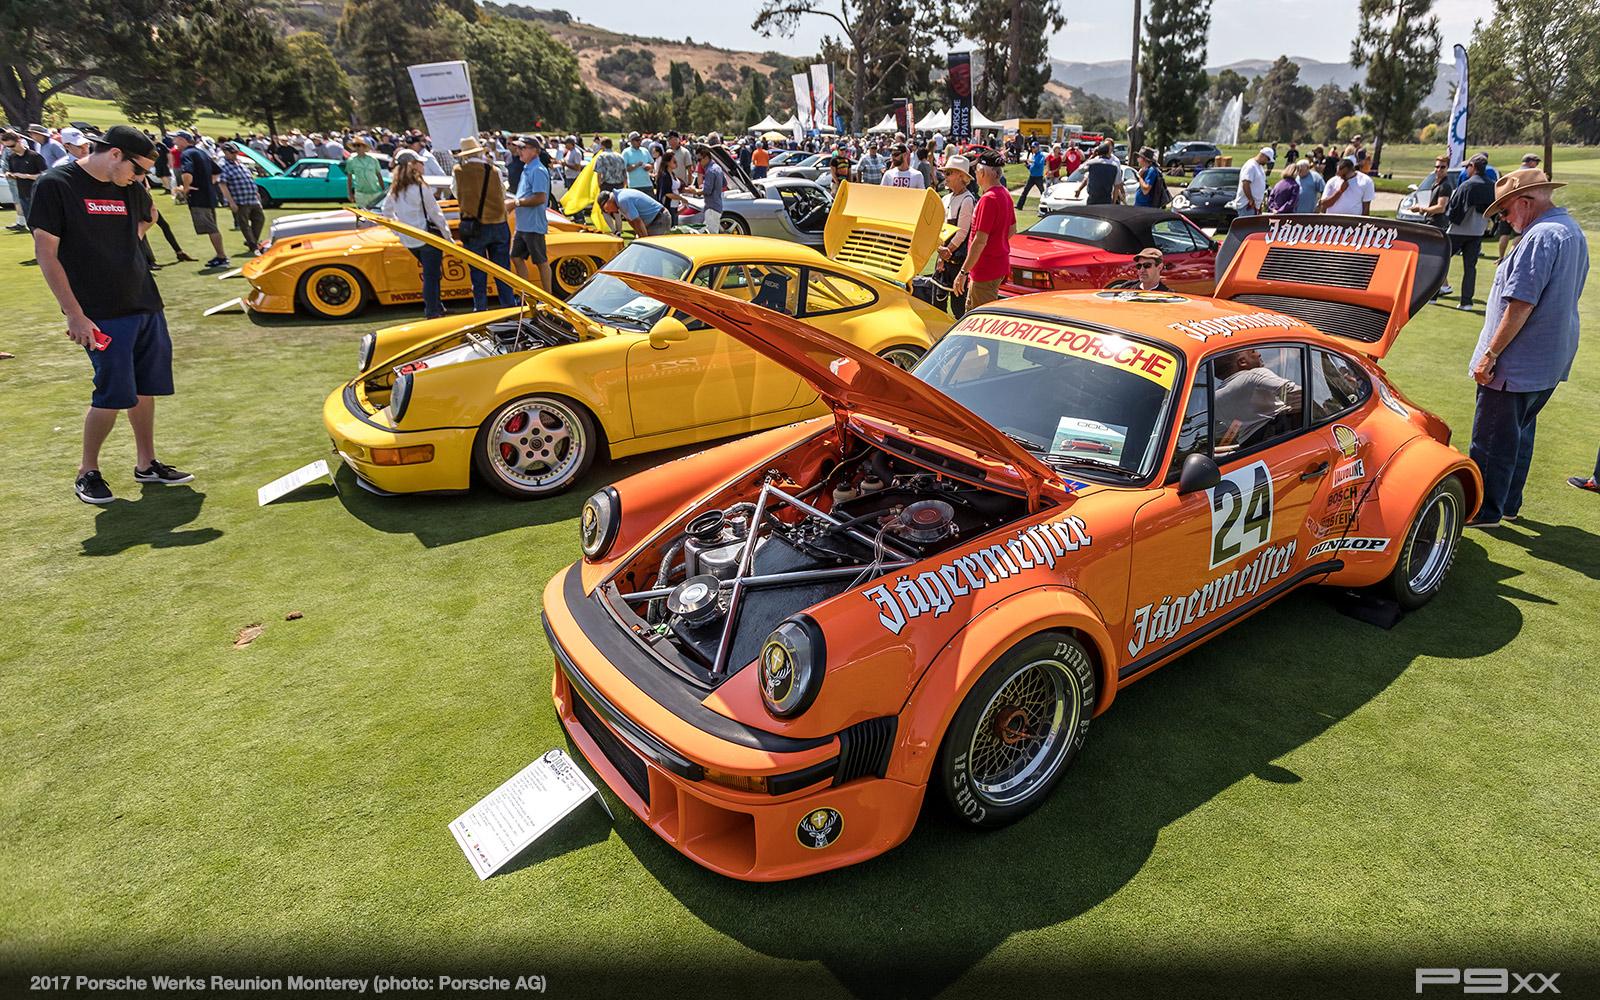 high_one_millionth_911_mazda_raceway_laguna_seca_monterey_2017_porsche_ag-4